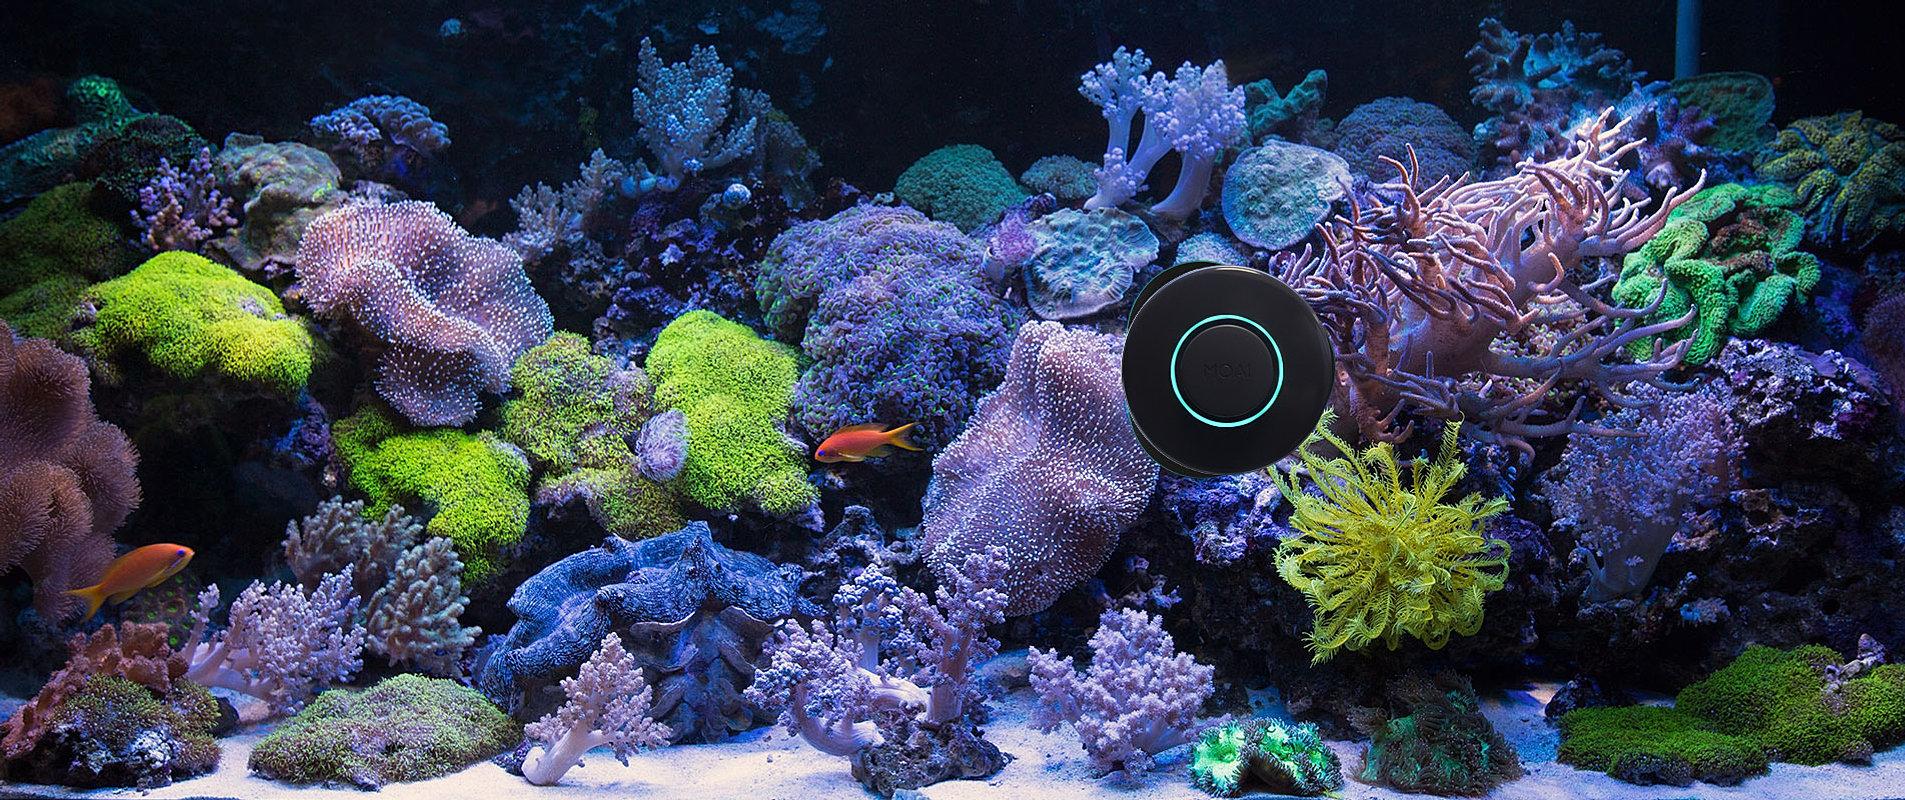 Fun Fish Tank Decorations Moai Smart Robot For Your Aquarium